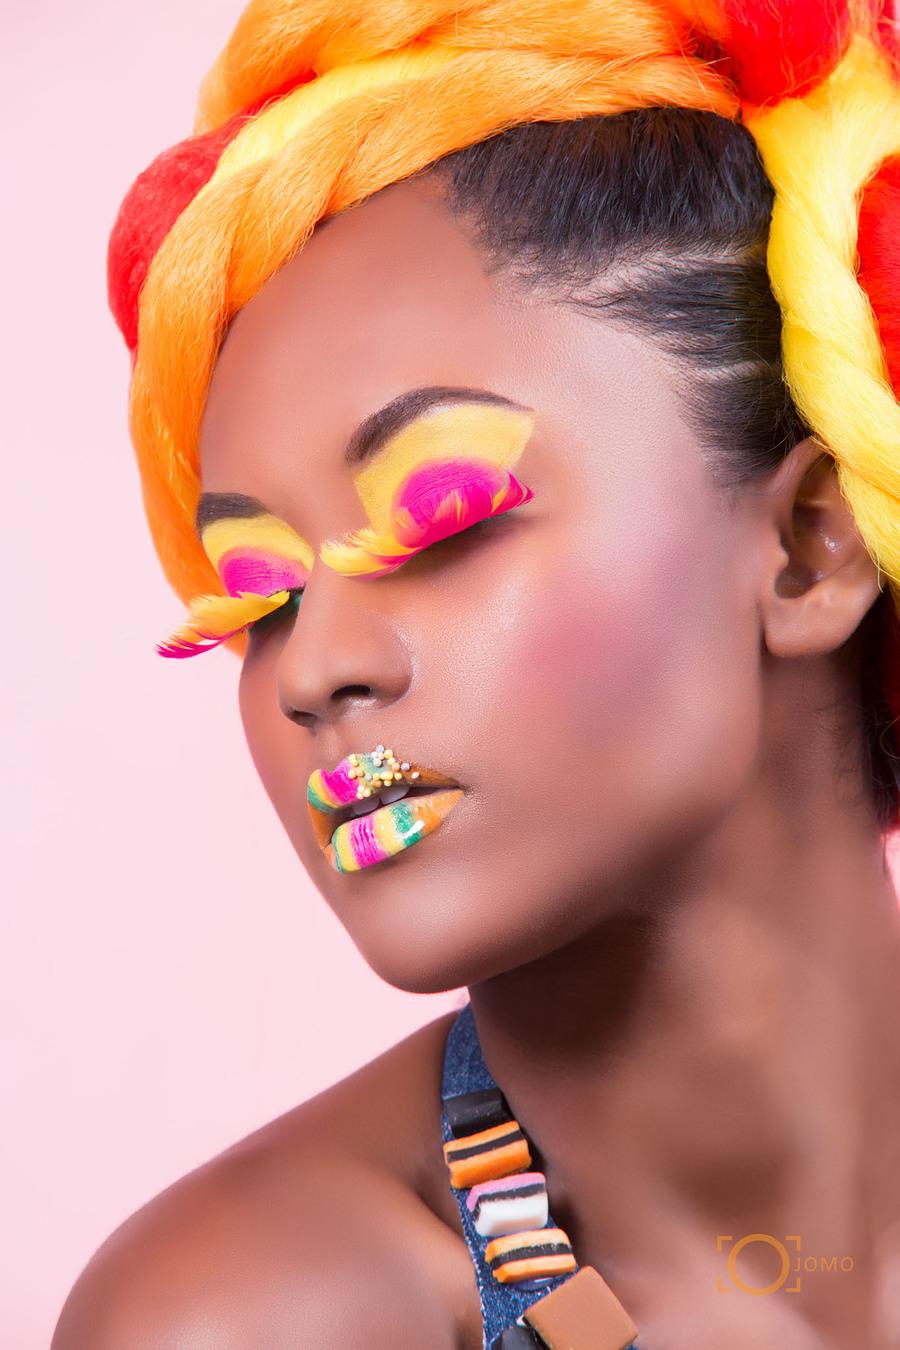 Candy Craze / Makeup by Genesis Creationz, Hair styling by Genesis Creationz / Uploaded 25th September 2015 @ 03:04 AM